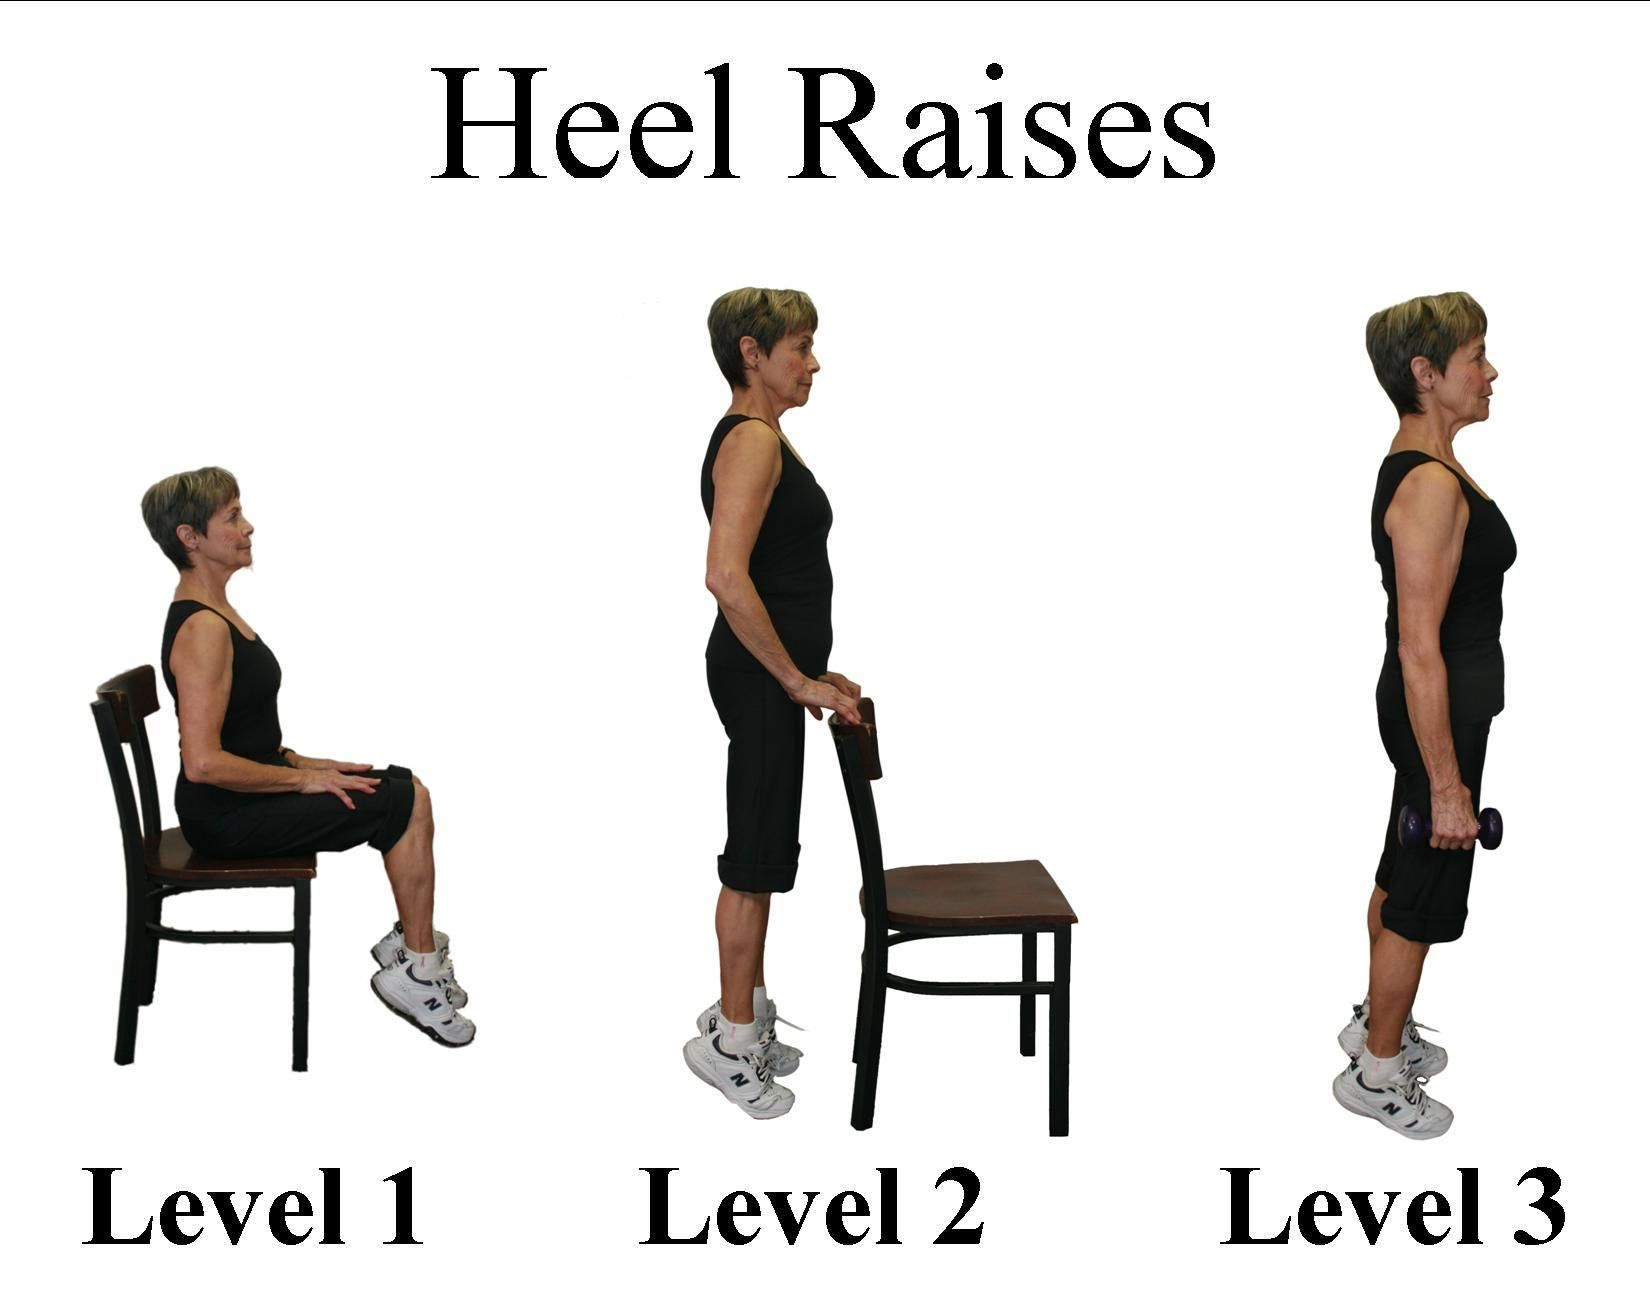 Chair exercise for seniors - Exercise Program For Older Adults Exercises Seniors Balance Strenth Pinterest Liikunta Ruokavalio Ja Painonpudotus